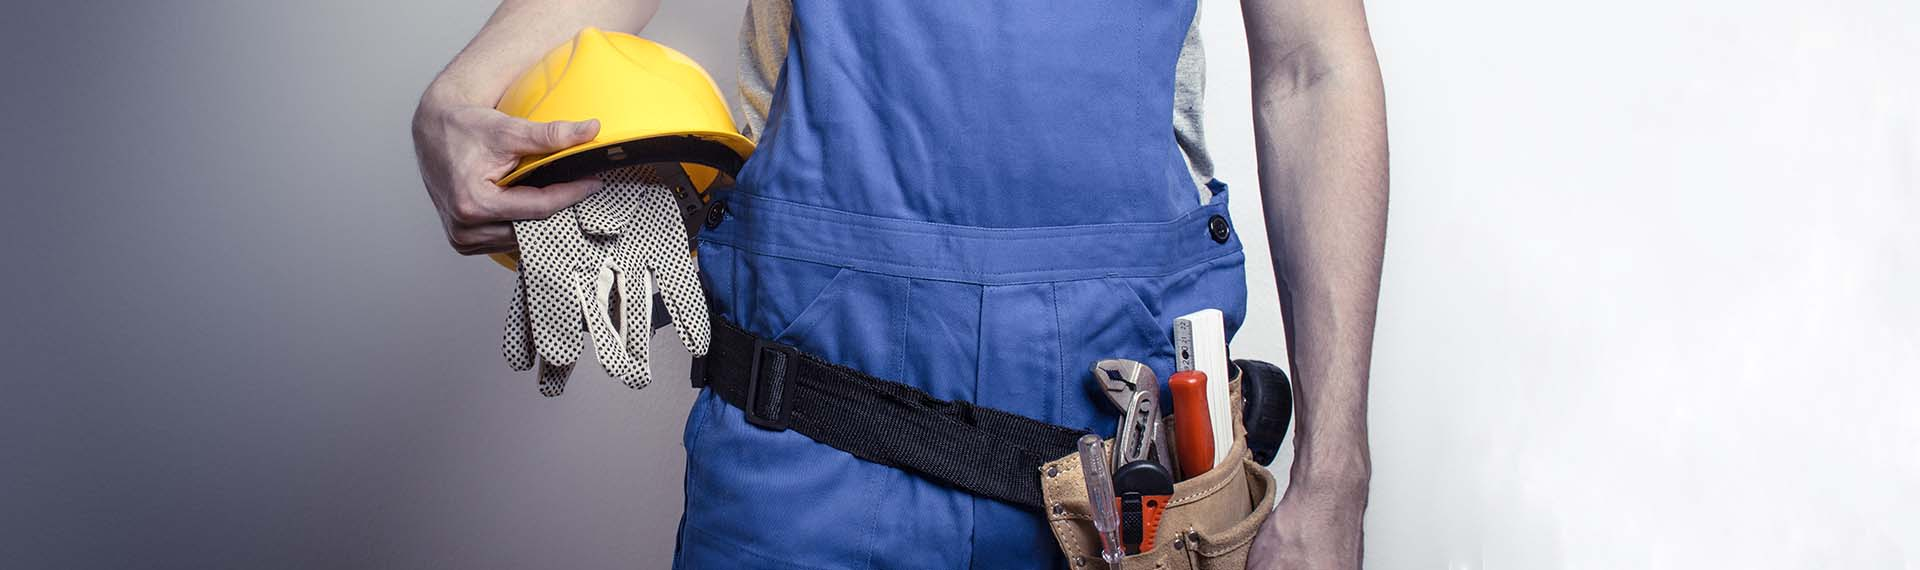 Technicien en plomberie disponible 24h/7